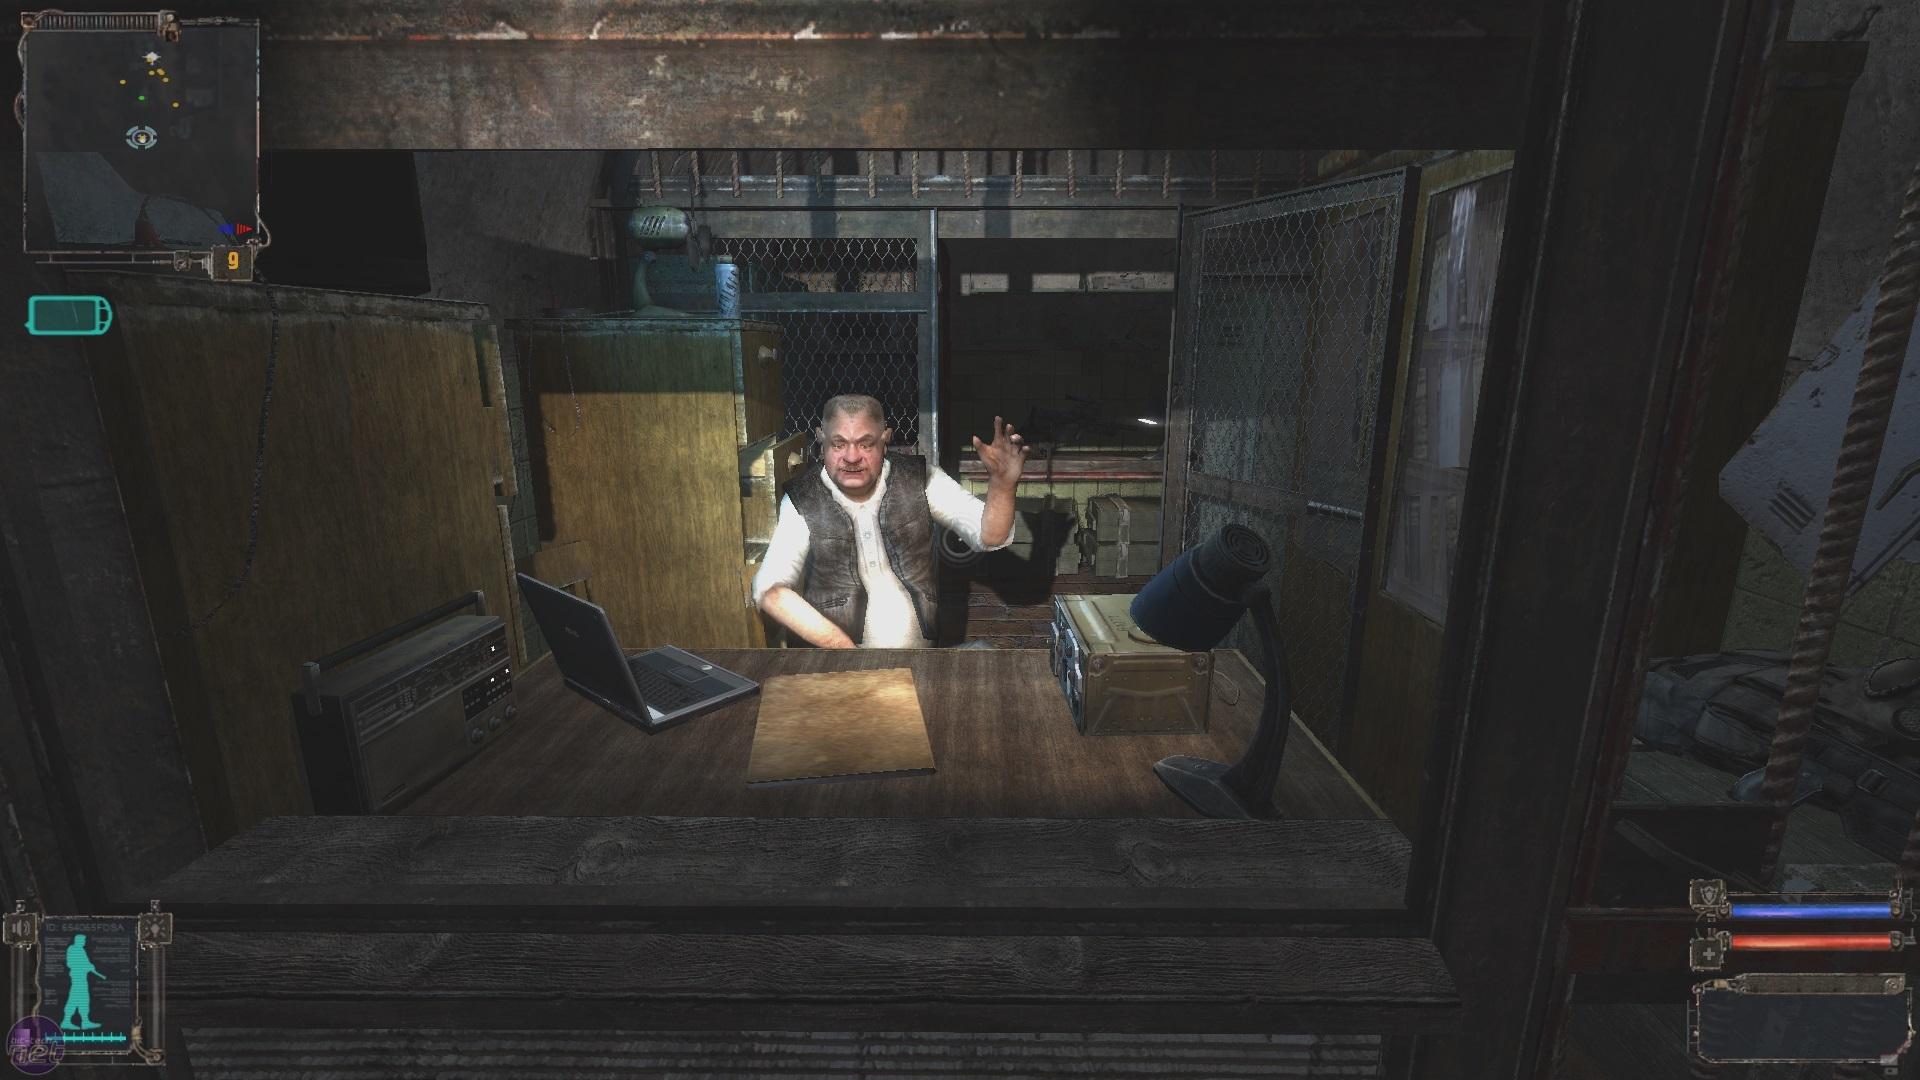 Virtual stalker